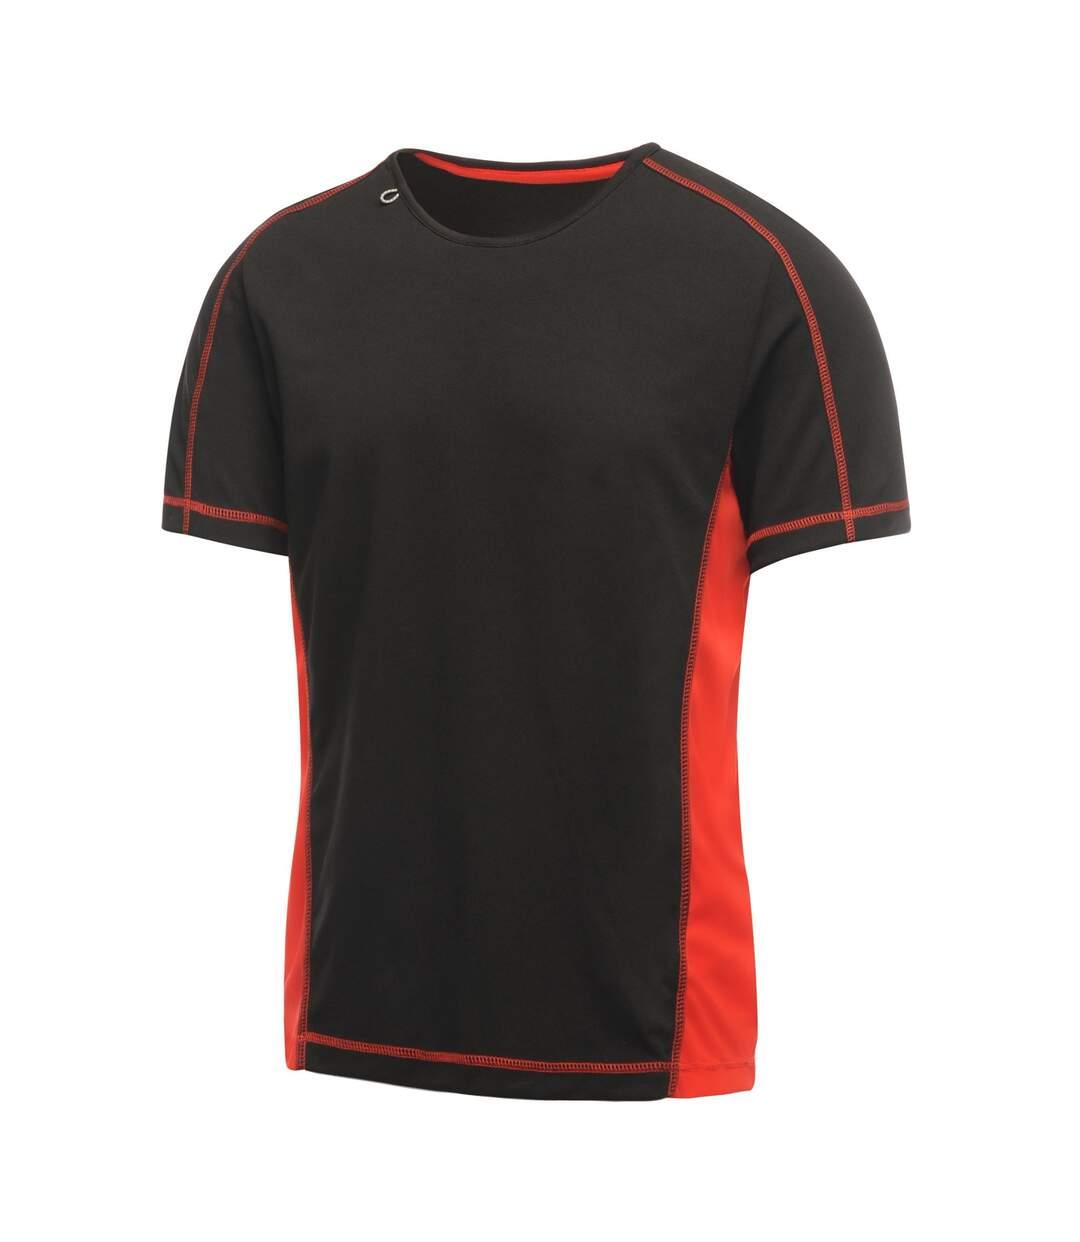 Regatta Activewear Mens Beijing Short Sleeve T-Shirt (Black/Classic Red) - UTRG2489